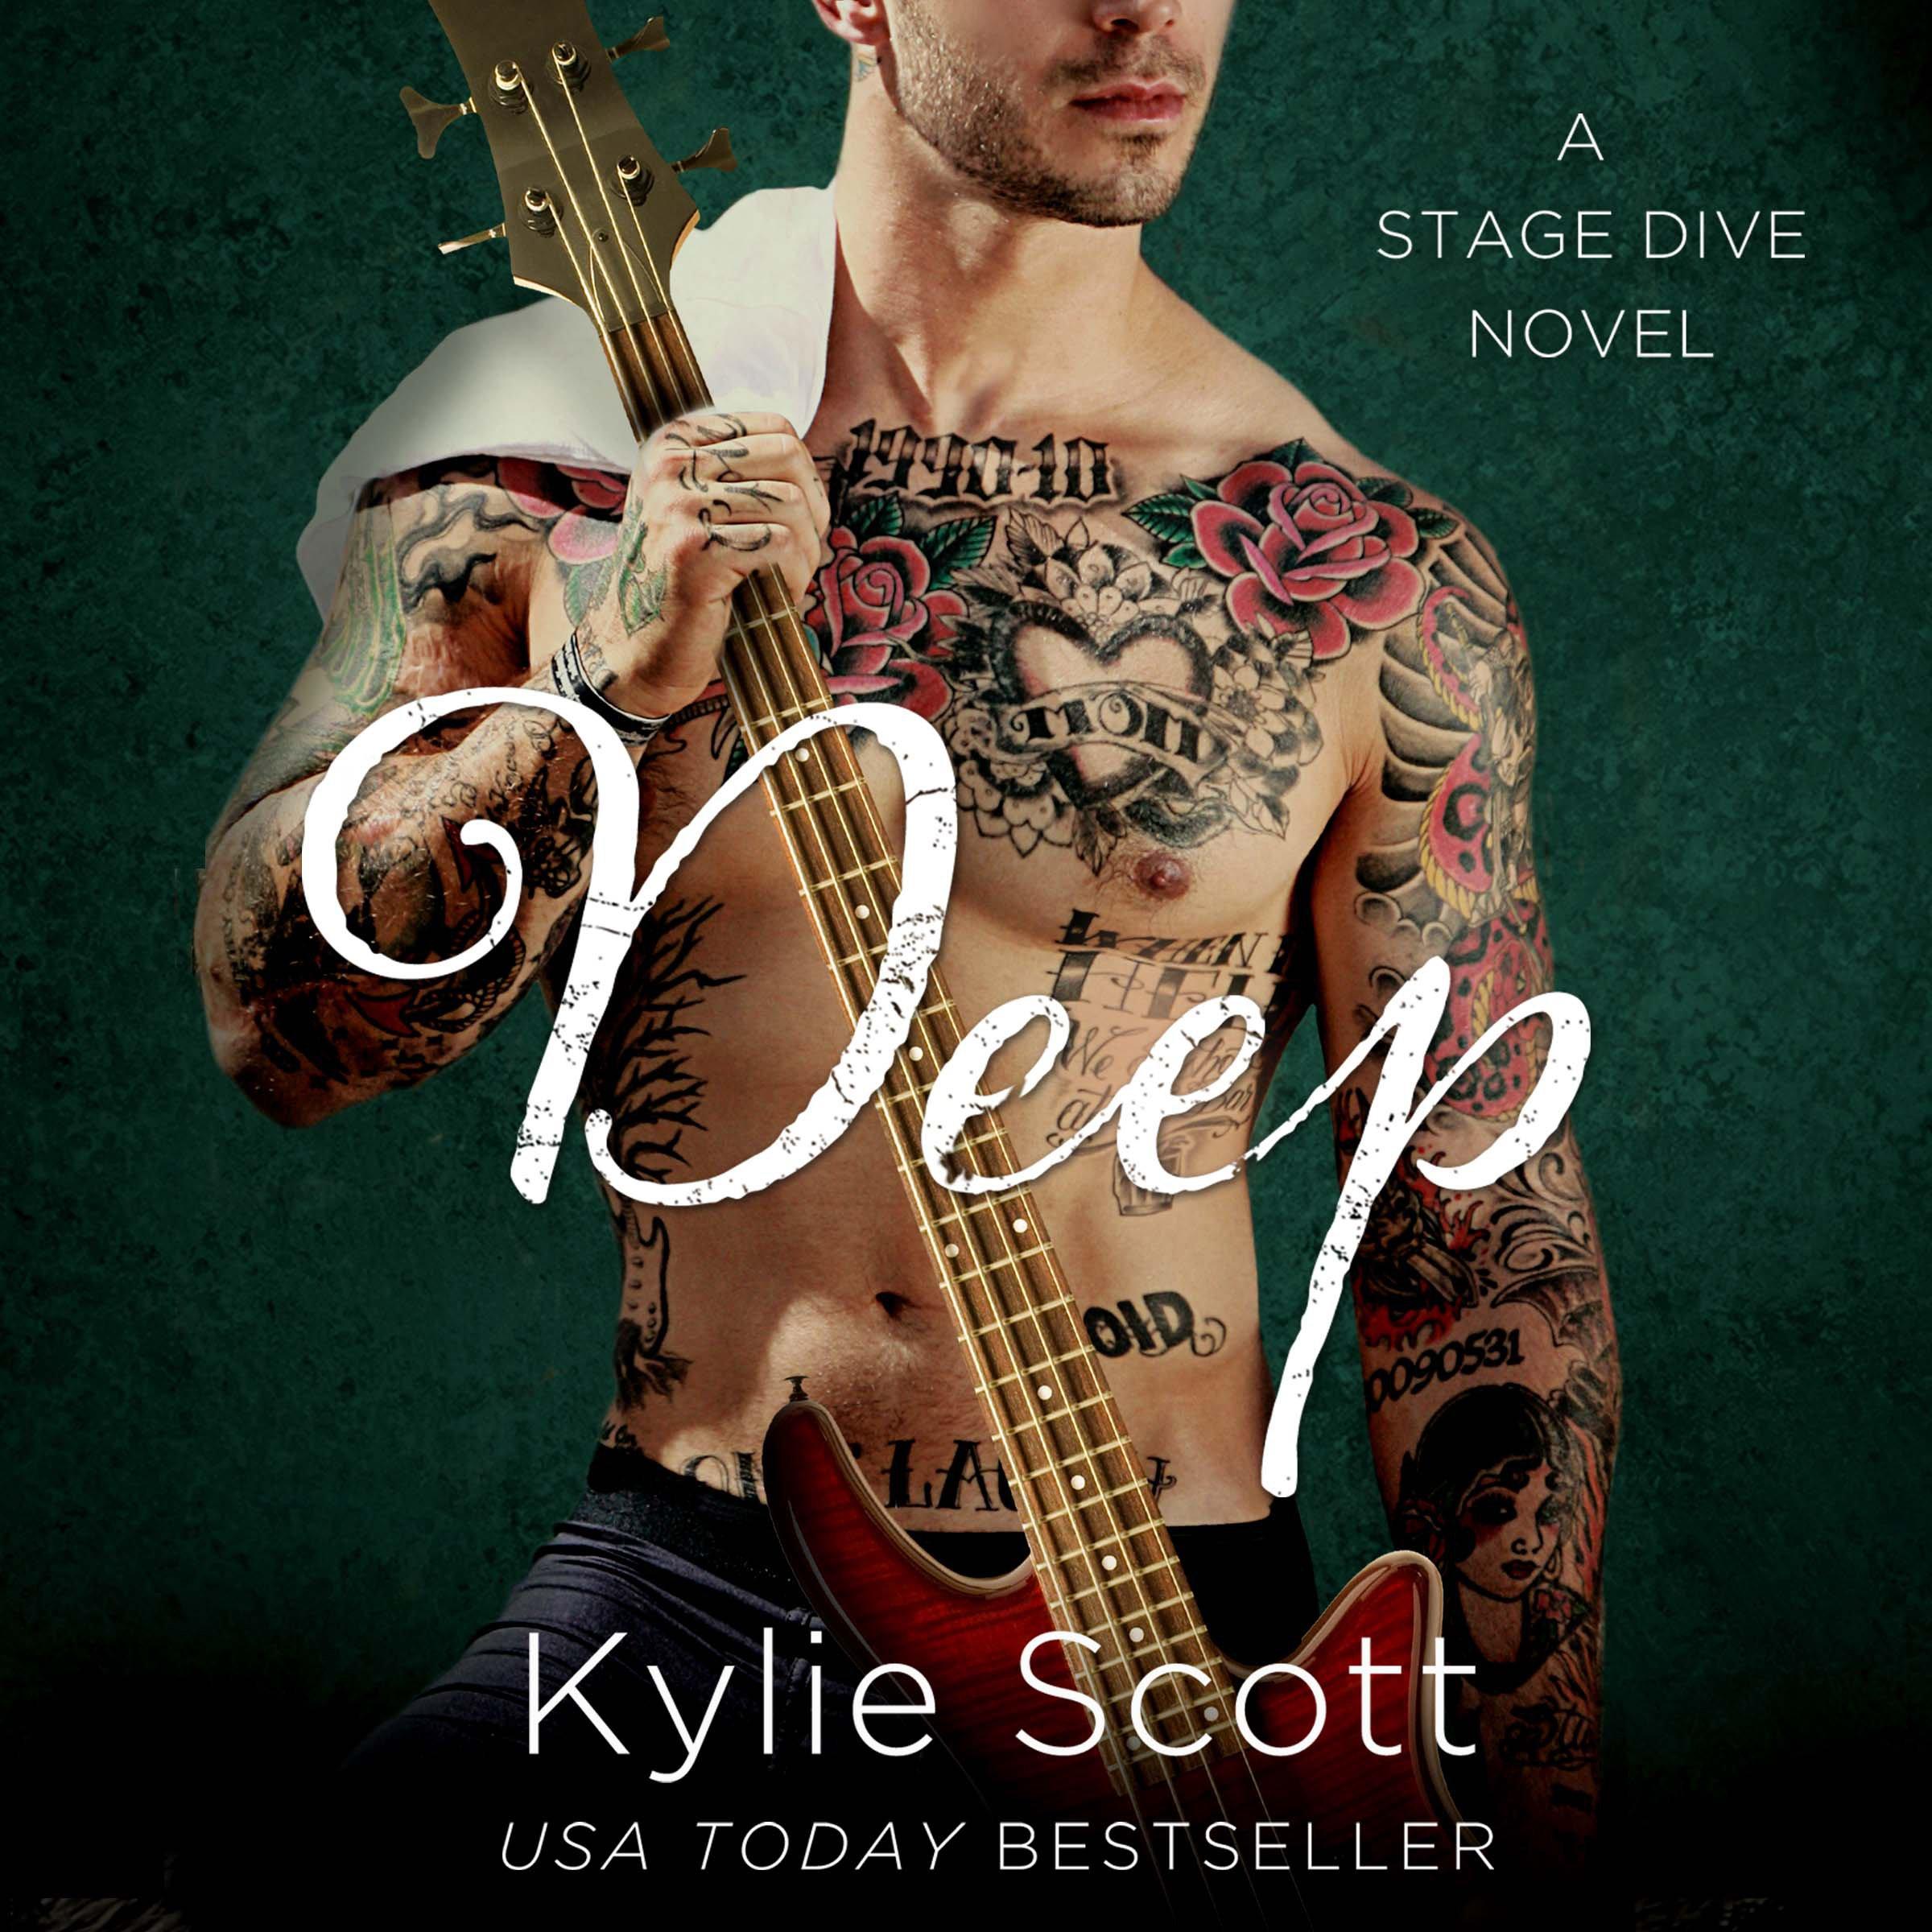 Deep: A Stage Dive Novel